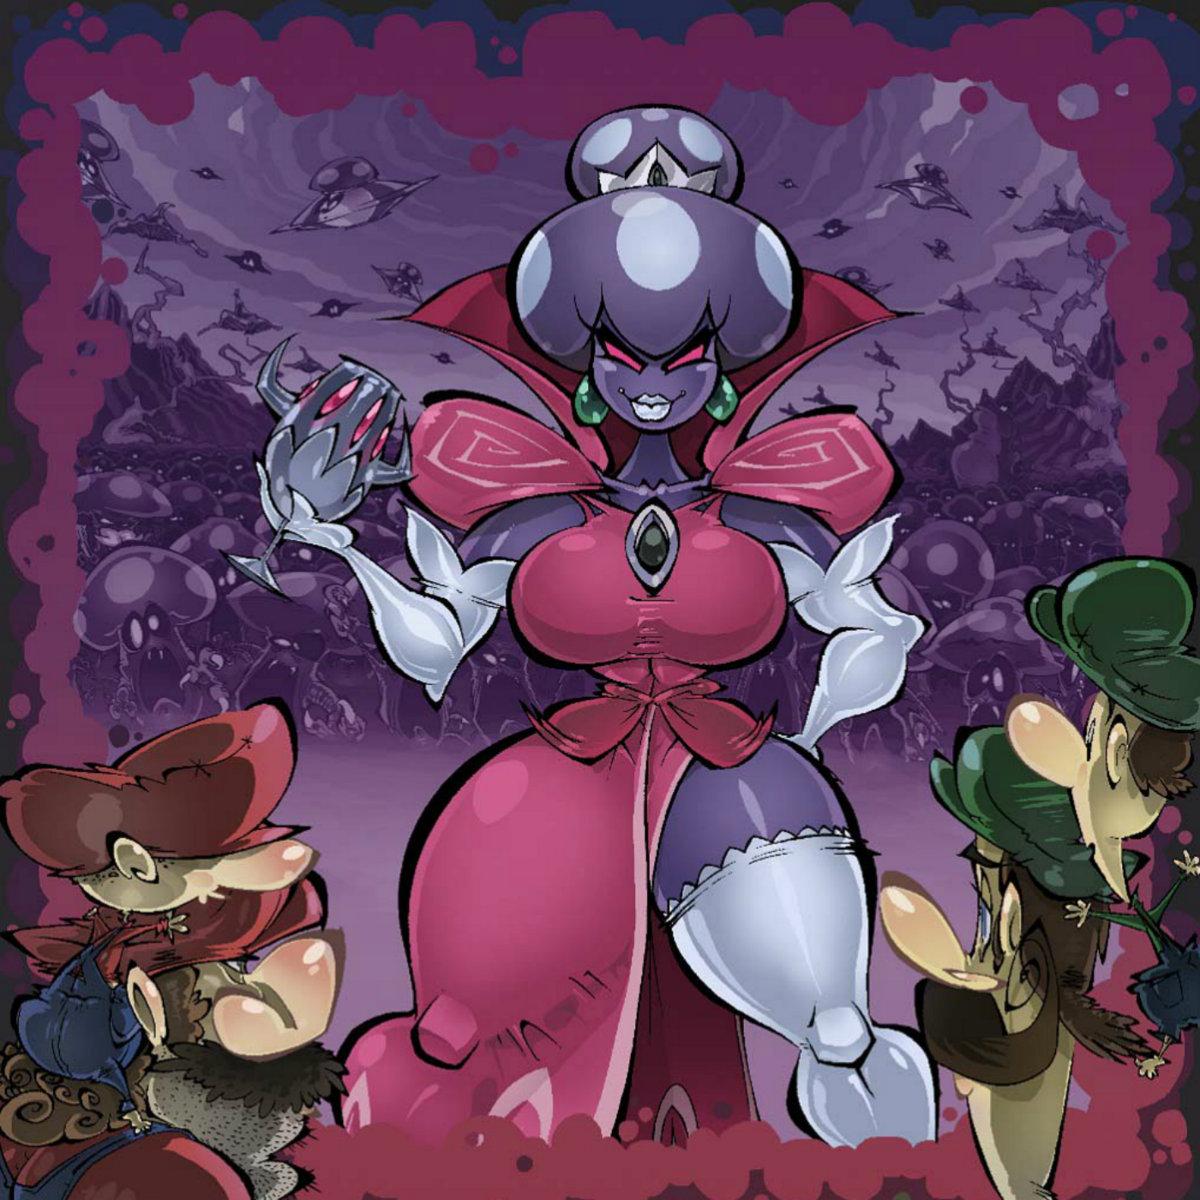 Princess Shroob Battle Mario Luigi Partners In Time Bw